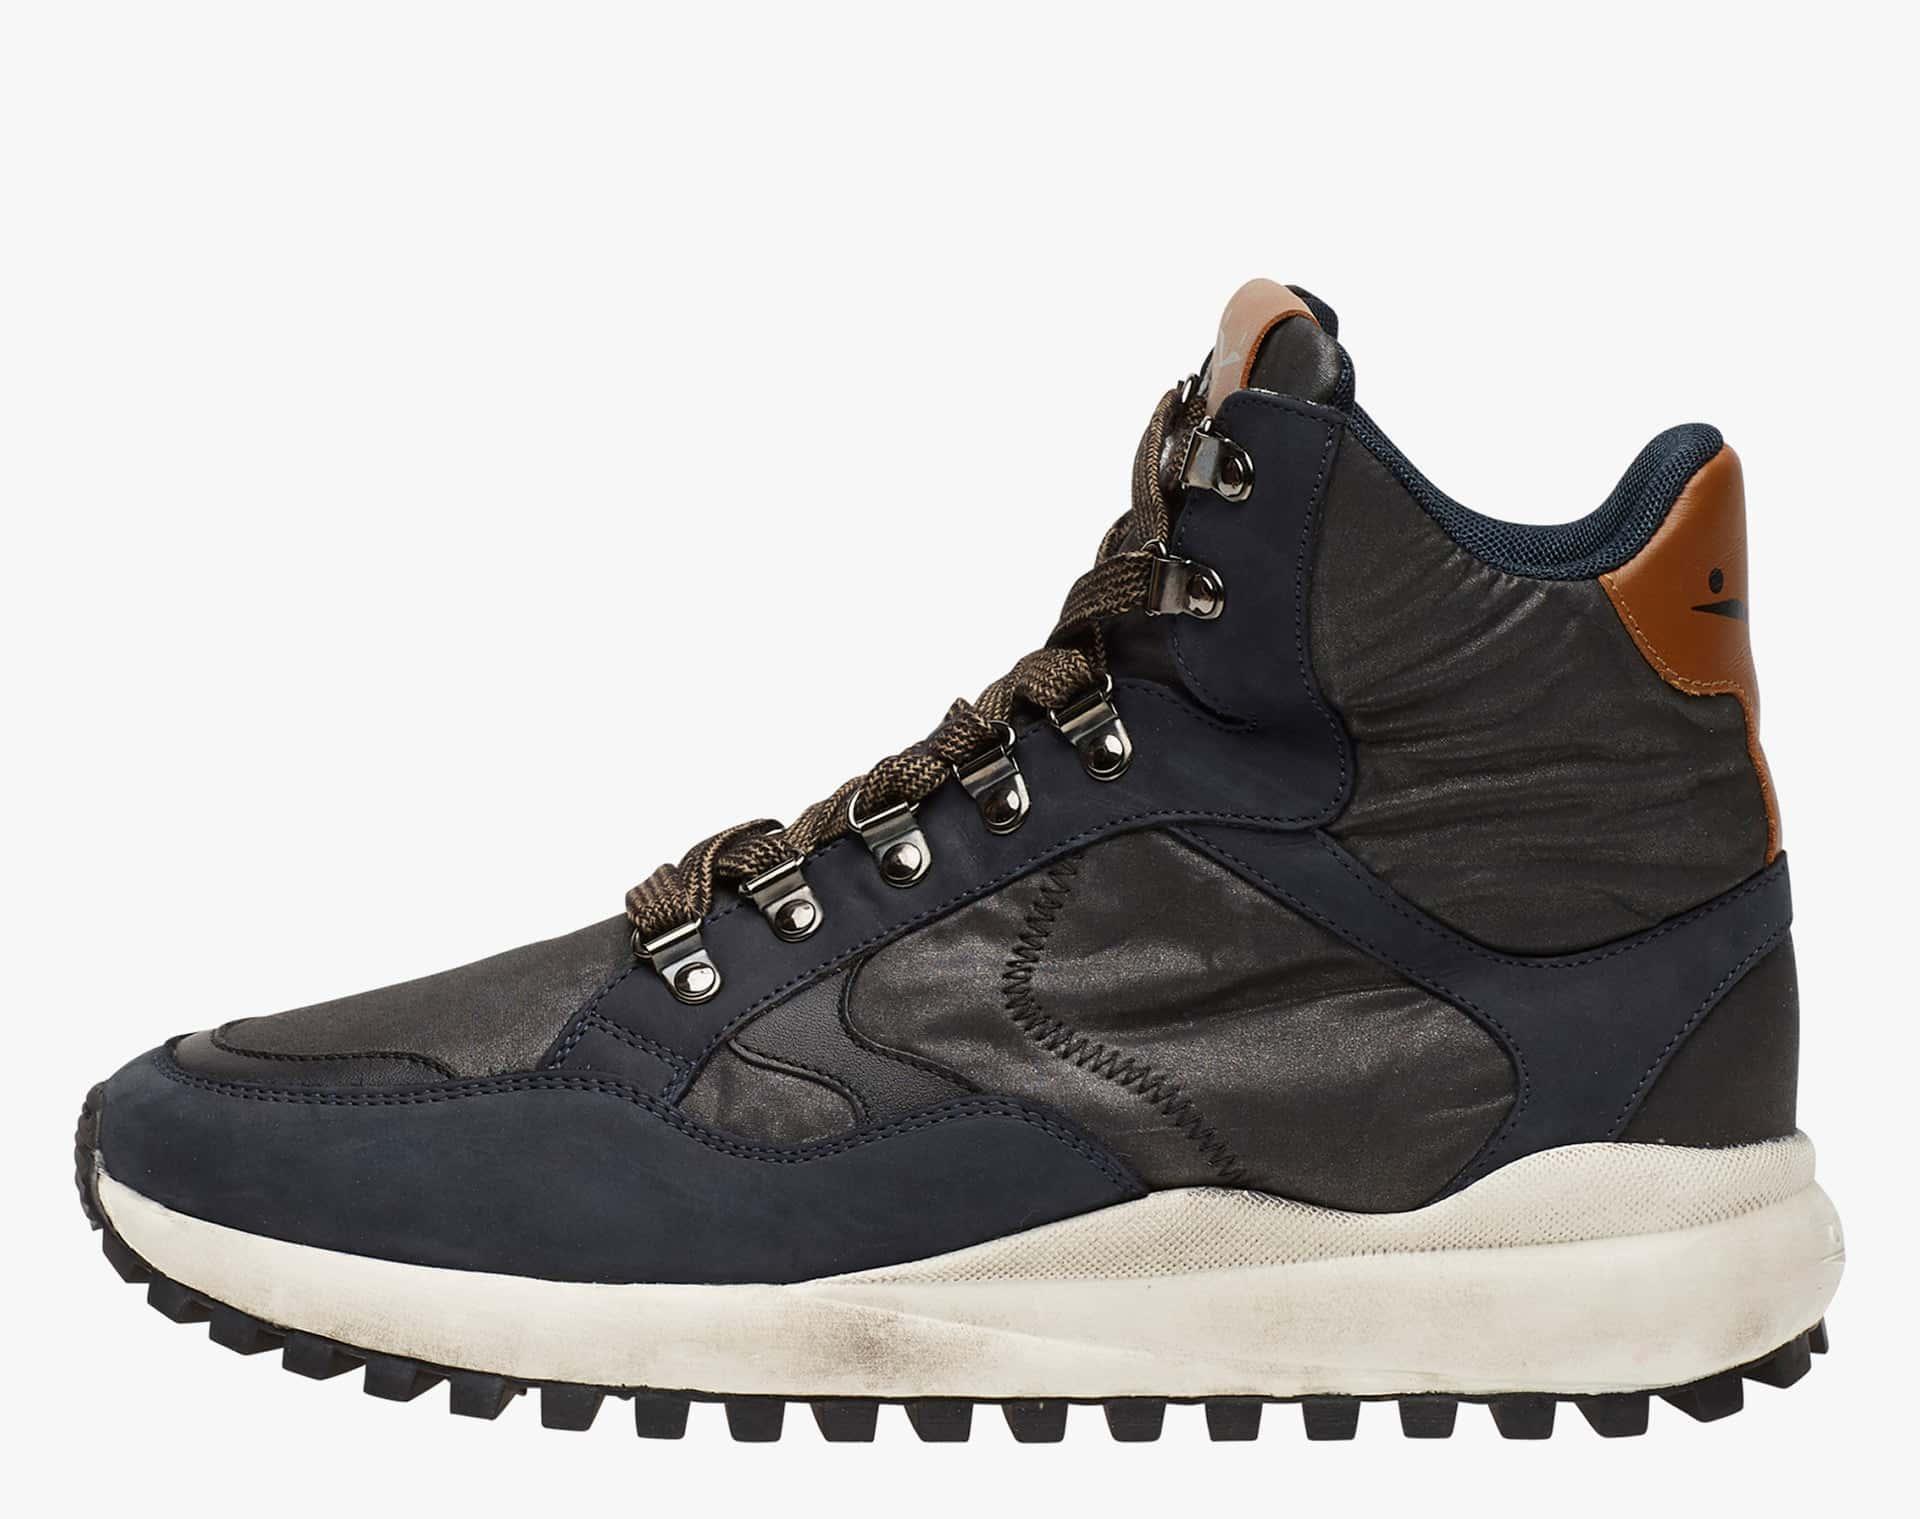 LARRY HIGH HOOK - brushed Nubuck leather - Blue-Black